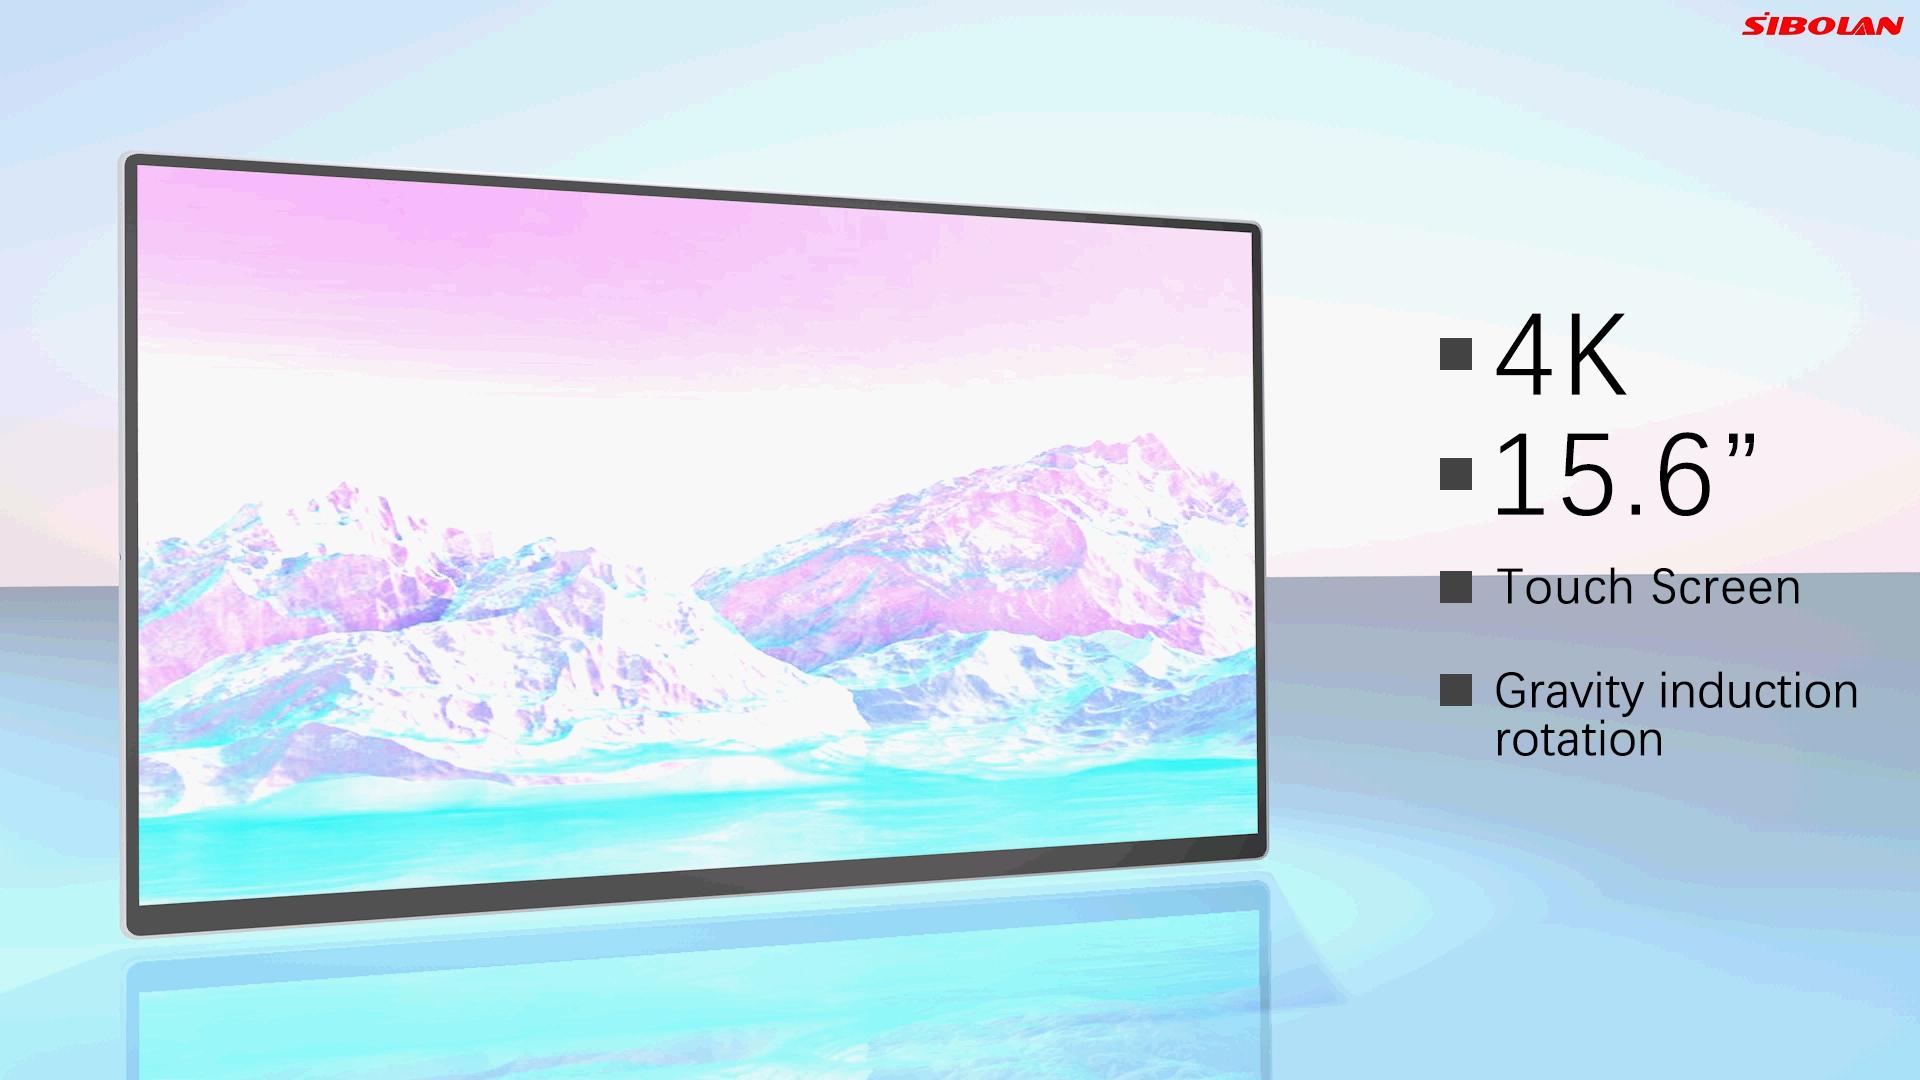 Sibolan 자동 회전 led 스크린 ips 터치스크린 휴대용 모니터 유형 c 4k 15.6 인치 노트북 스마트 폰 pc ps5